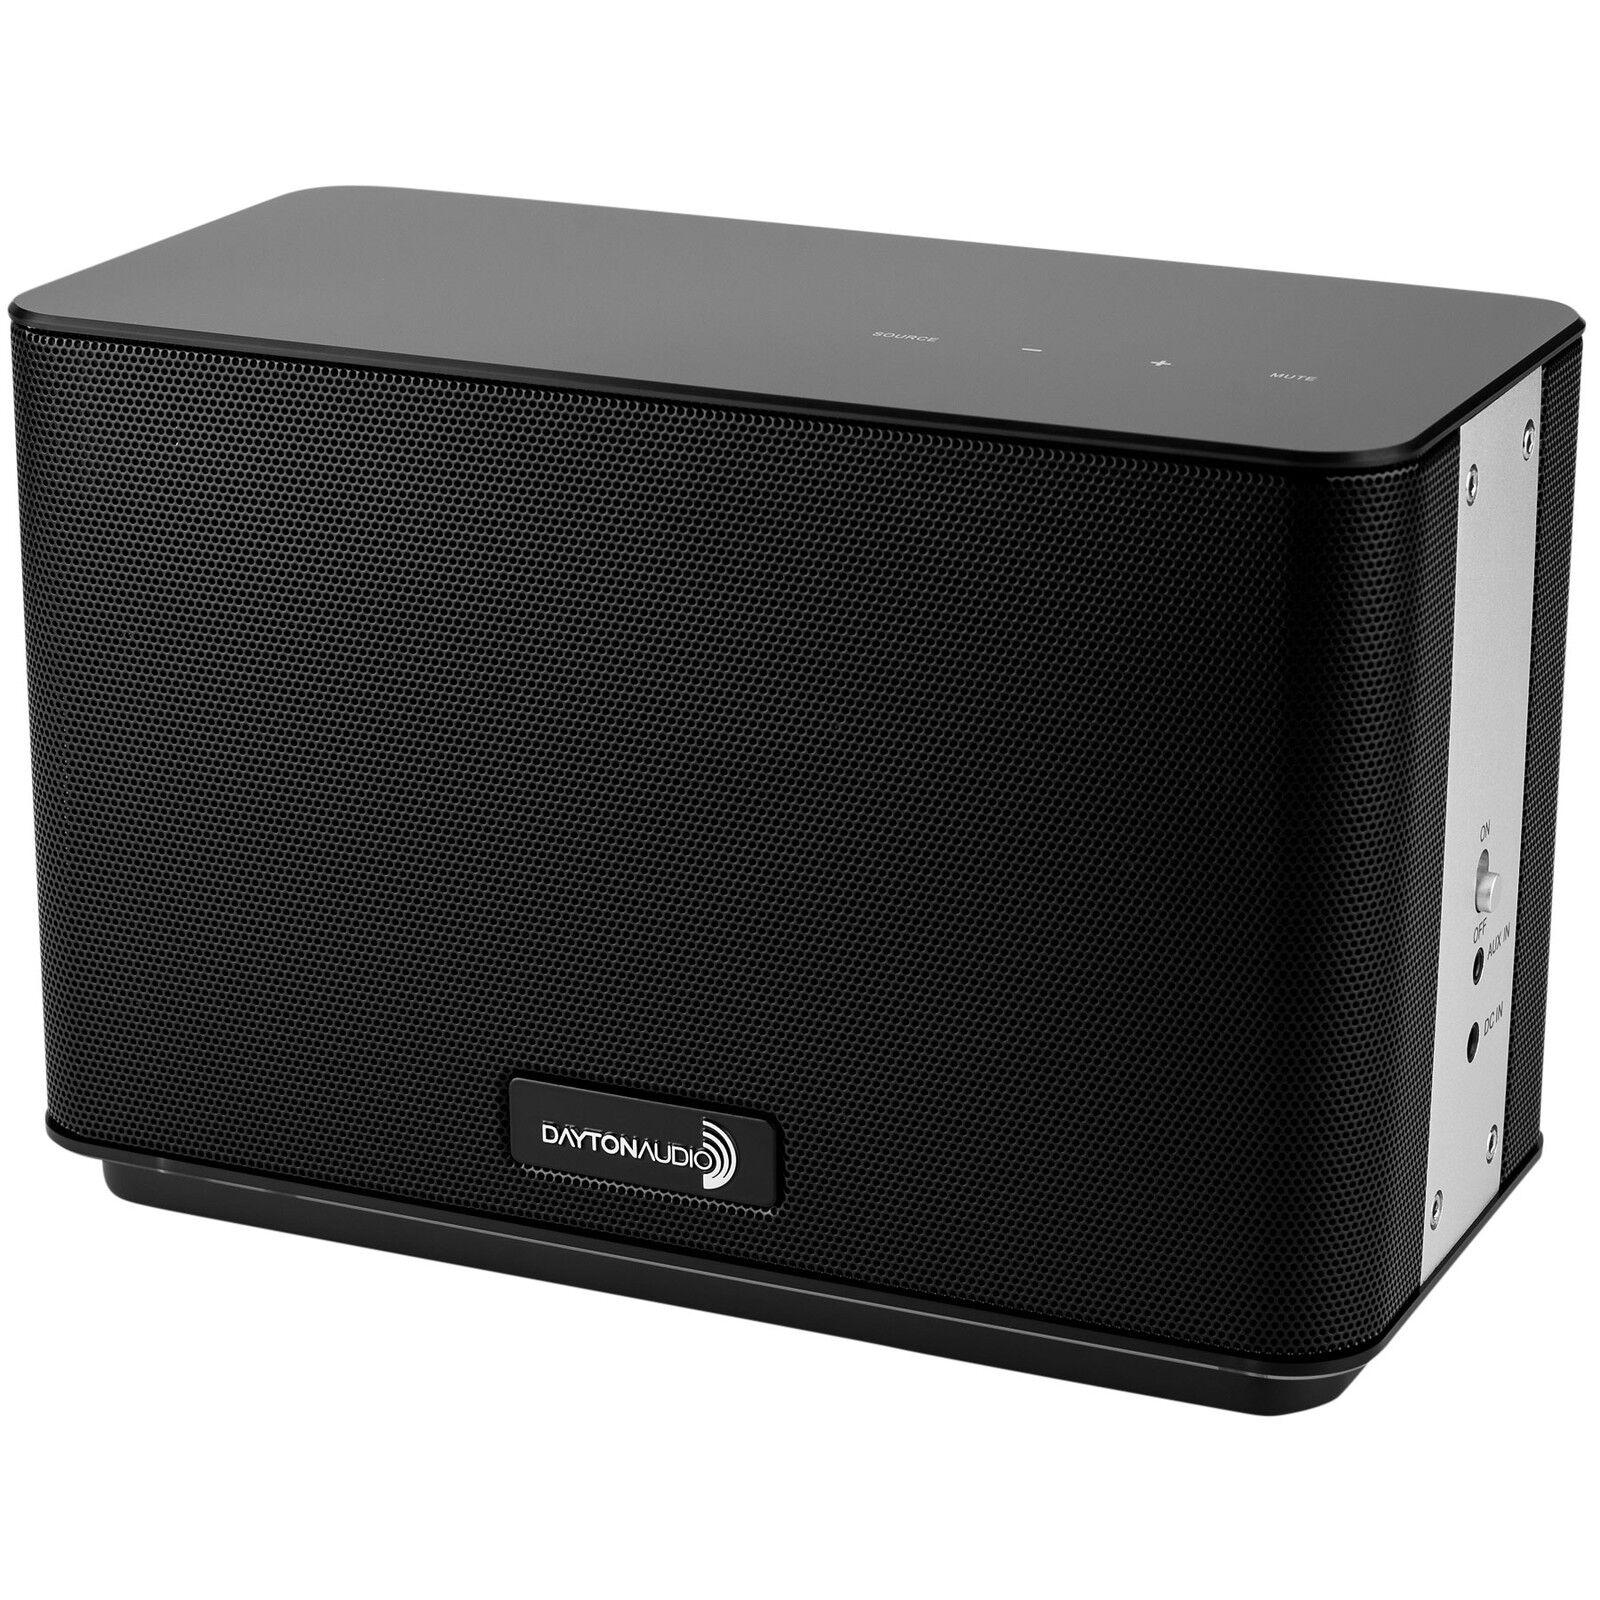 Dayton Audio AERO Wi-Fi azultooth Altavoz con control remoto remoto remoto IR Negro 109525